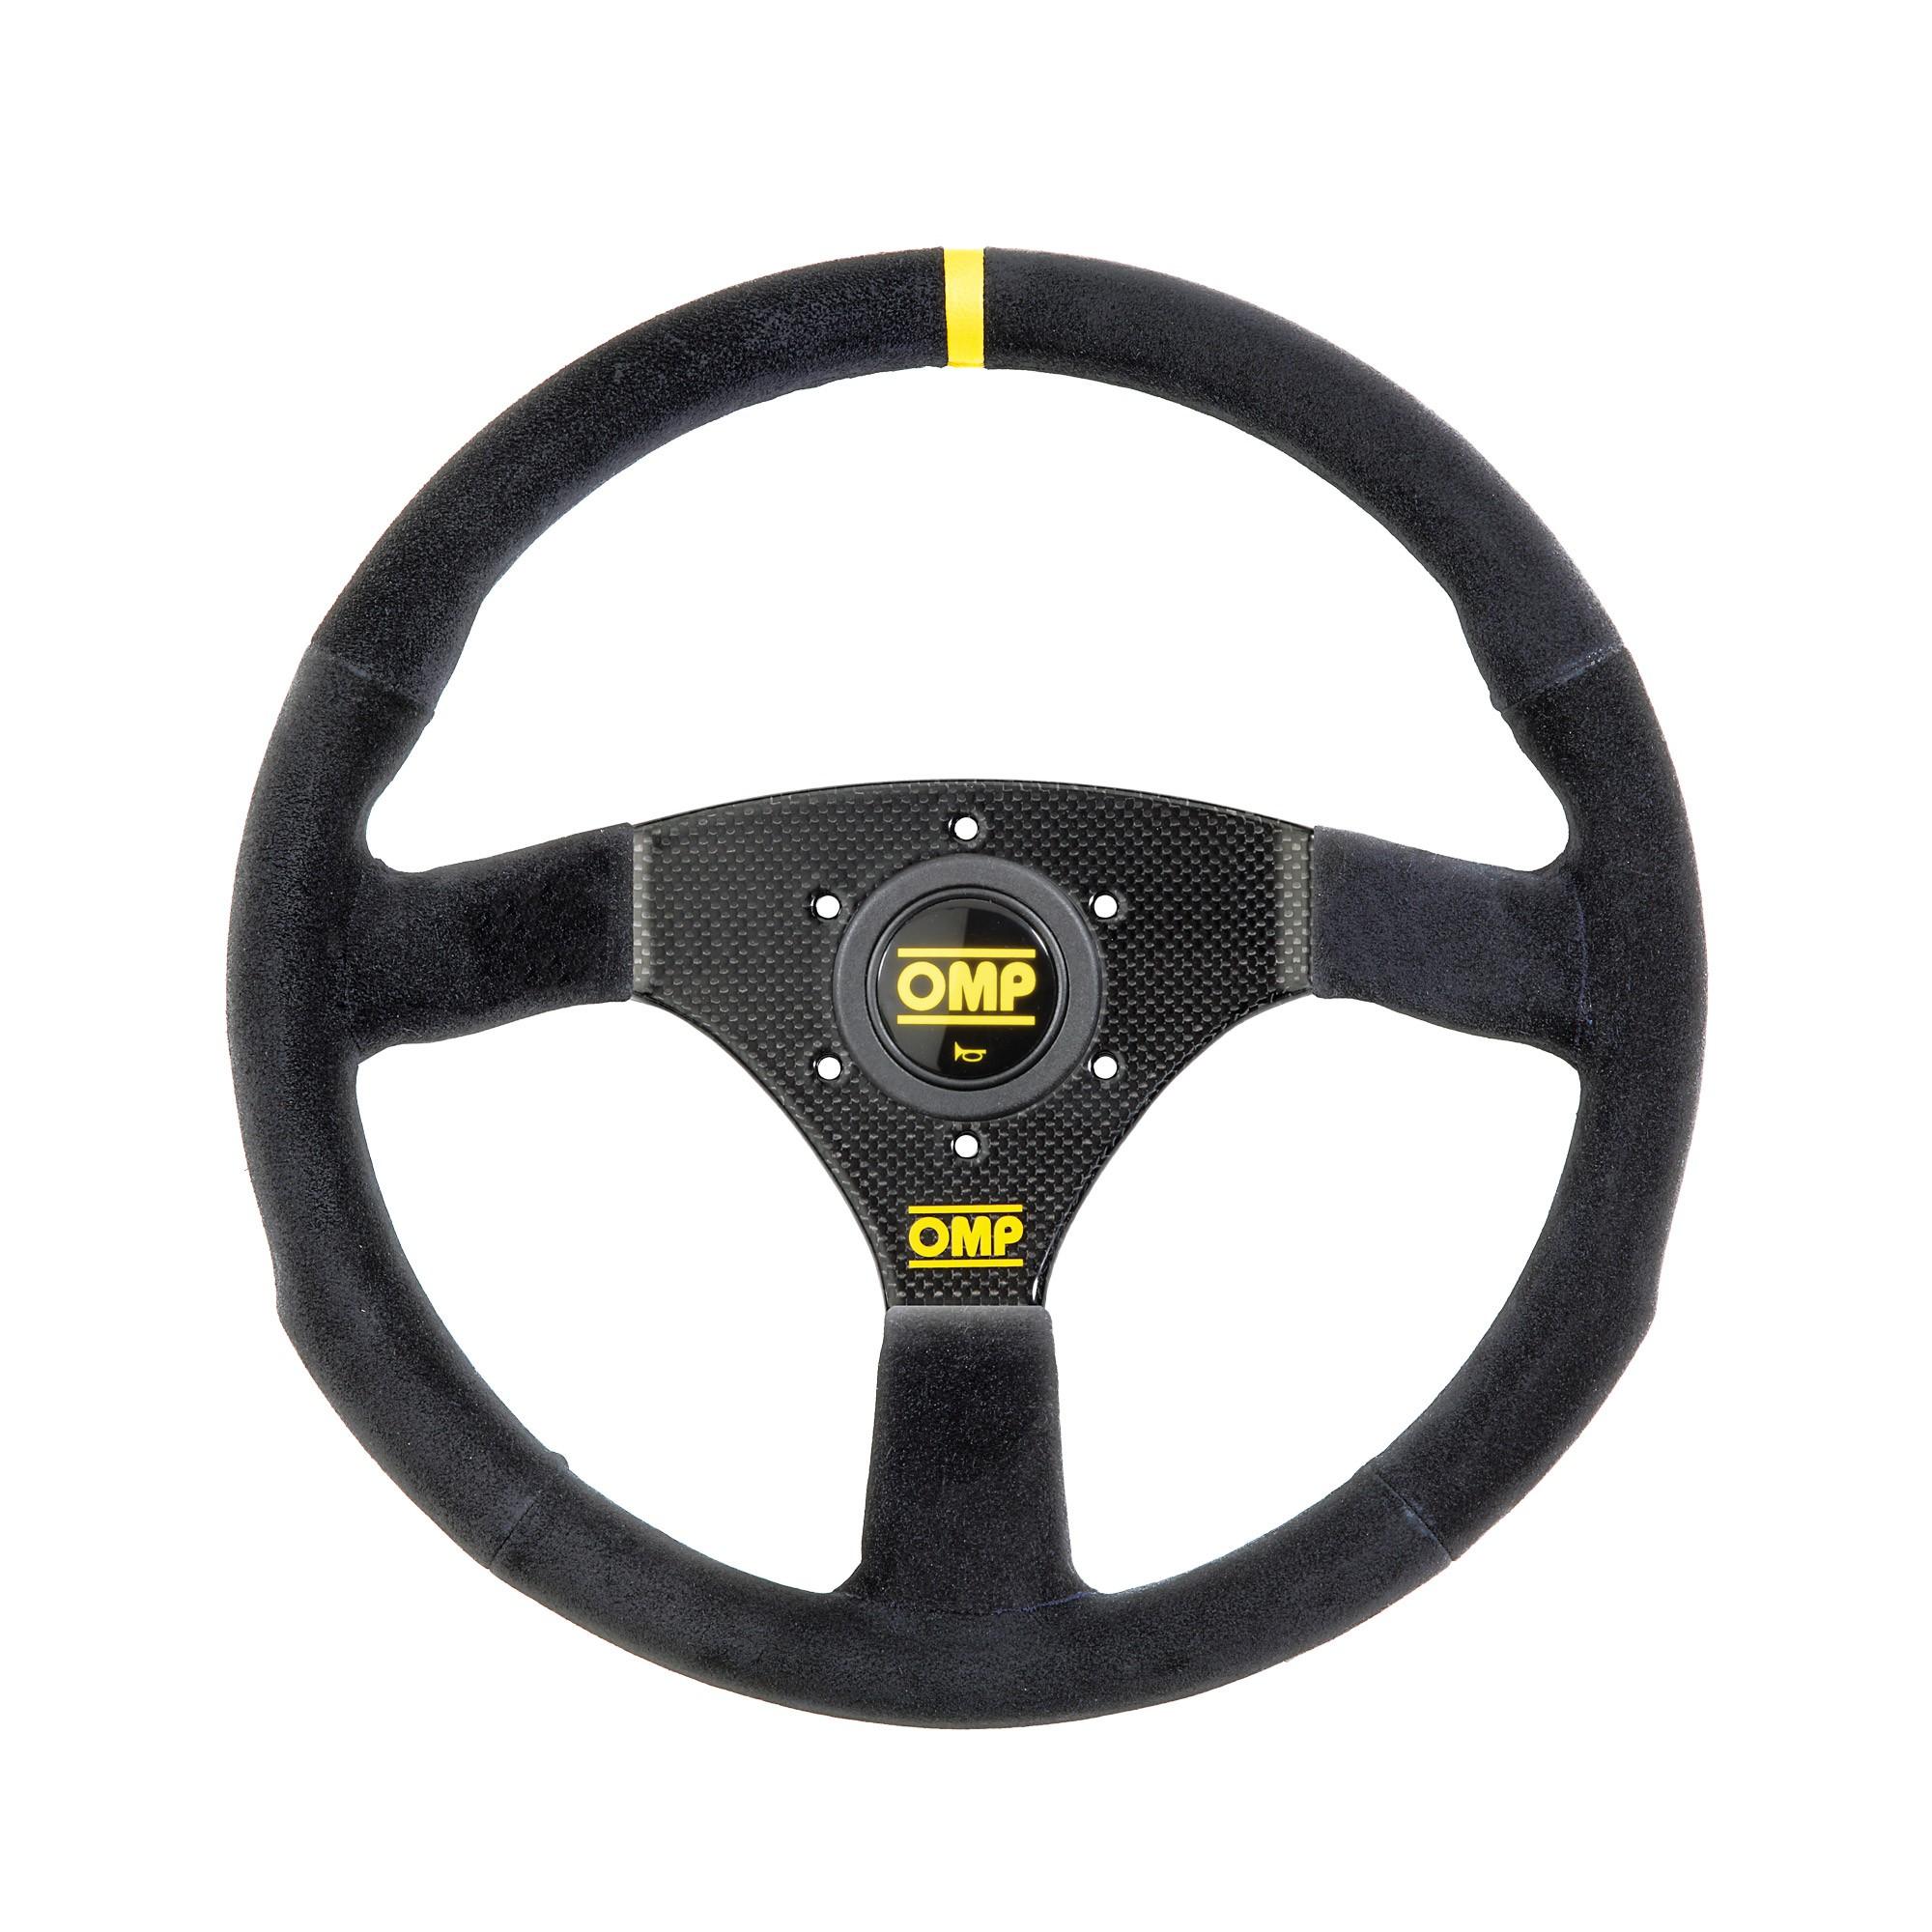 Carbon racing steering wheel - 320 CARBON S